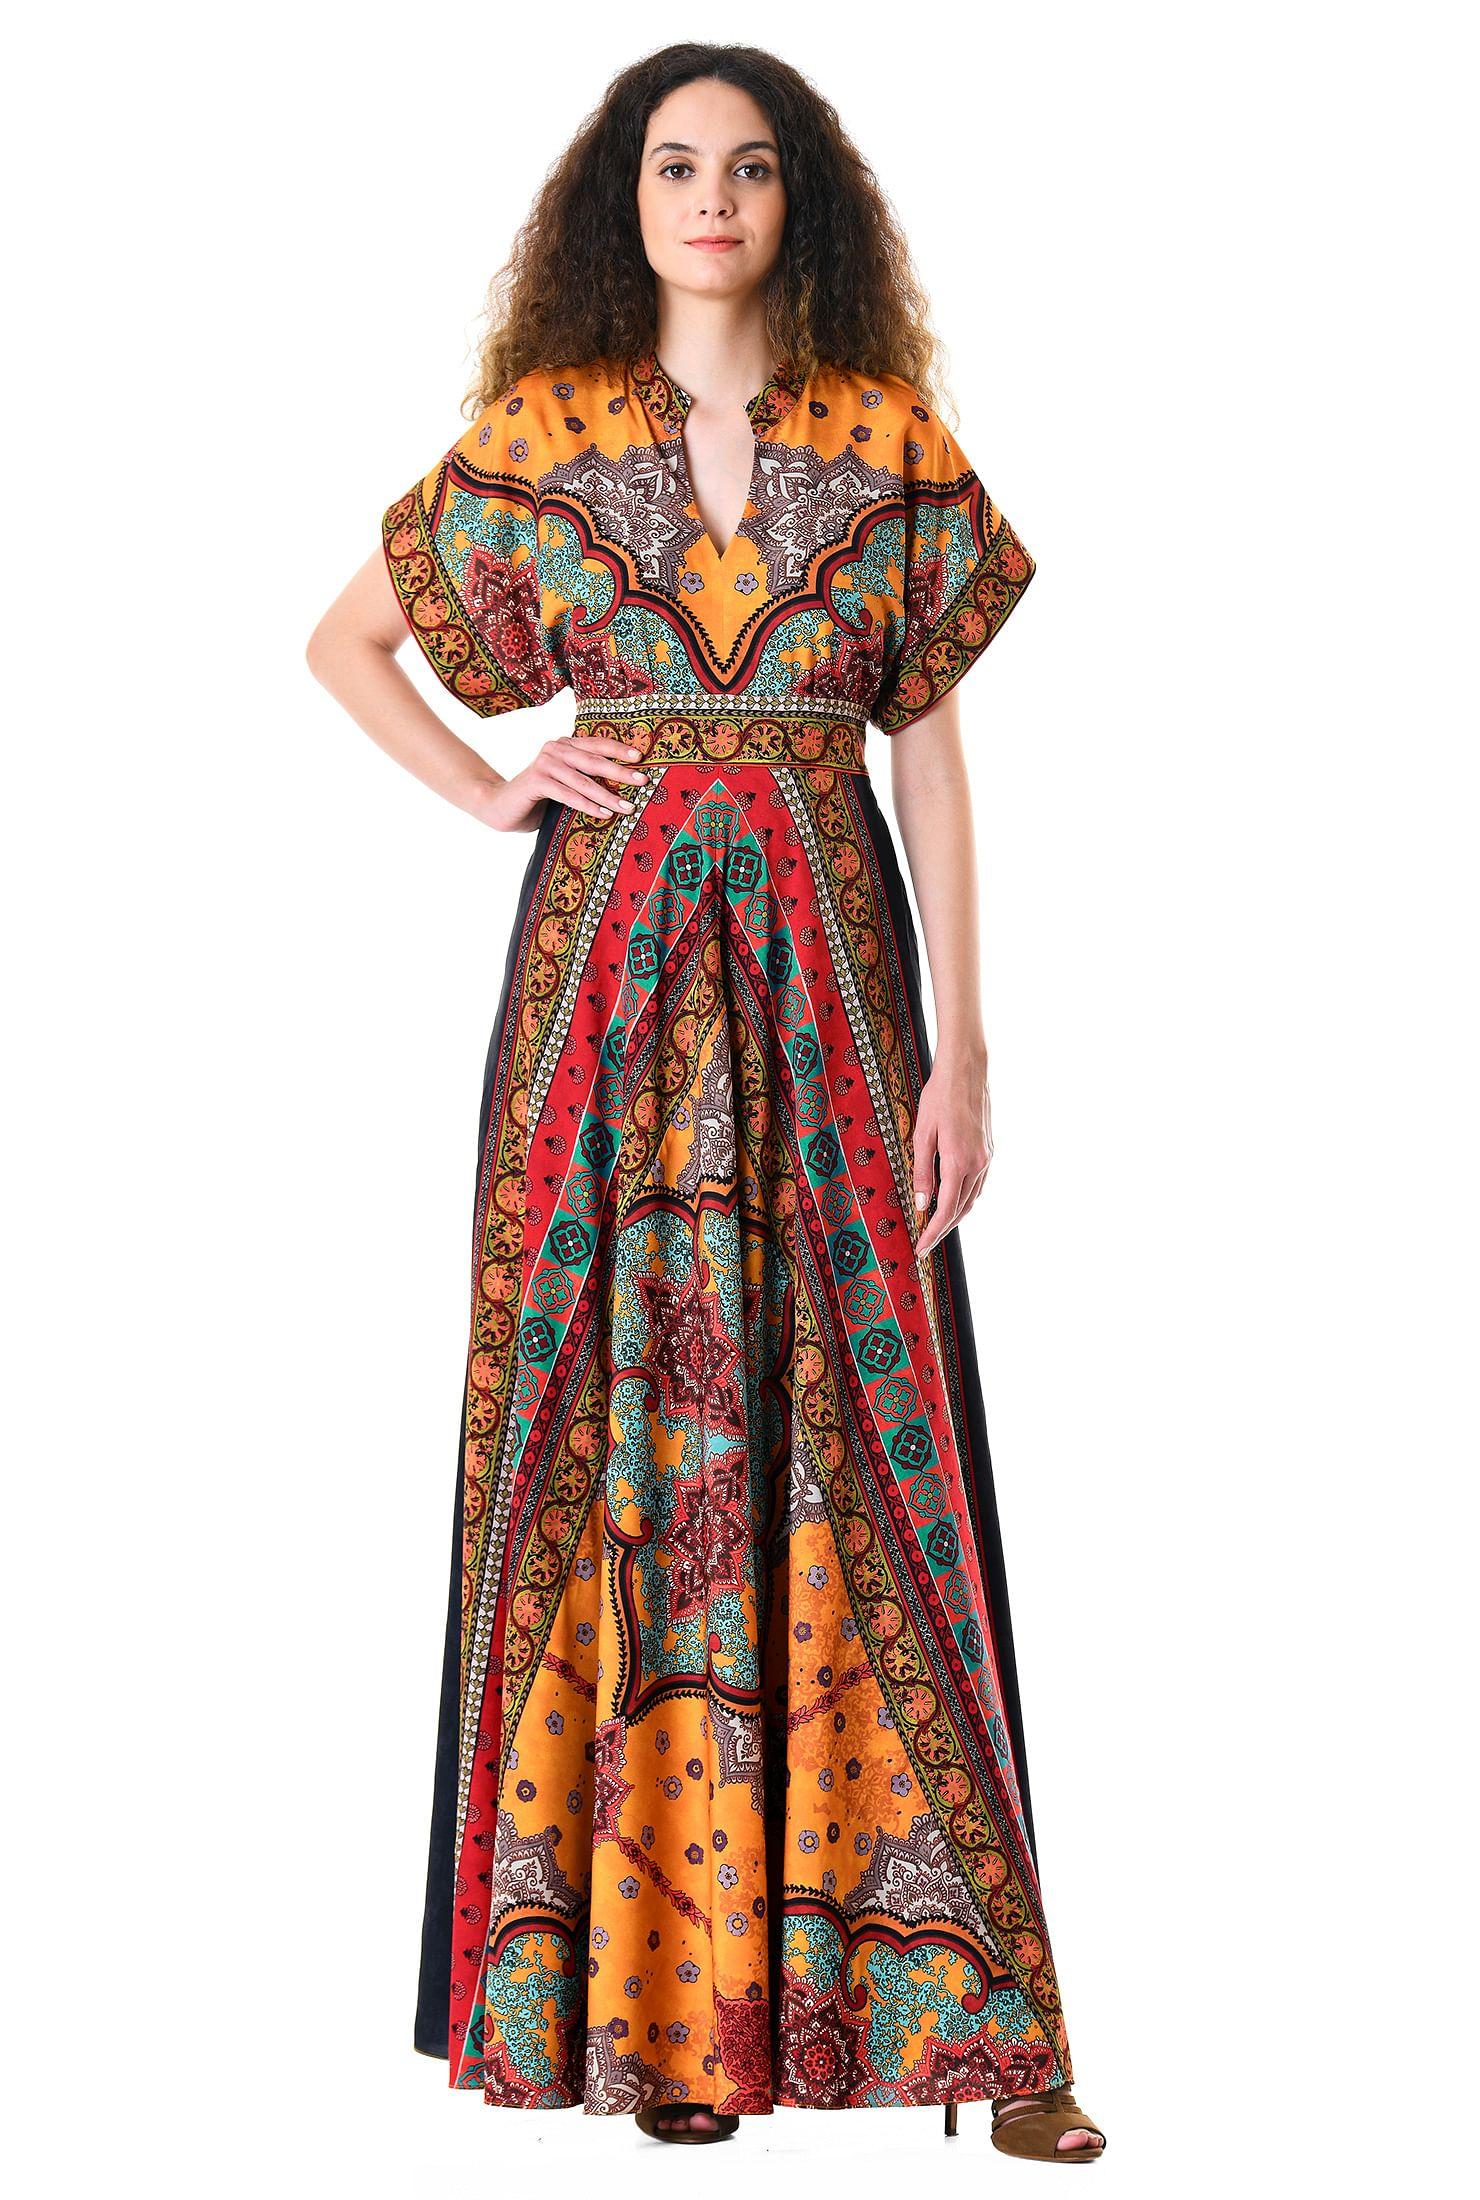 64090b581f1f9 bohemian, cover-ups, crepe dresses, dolman sleeve dresses, empire waist